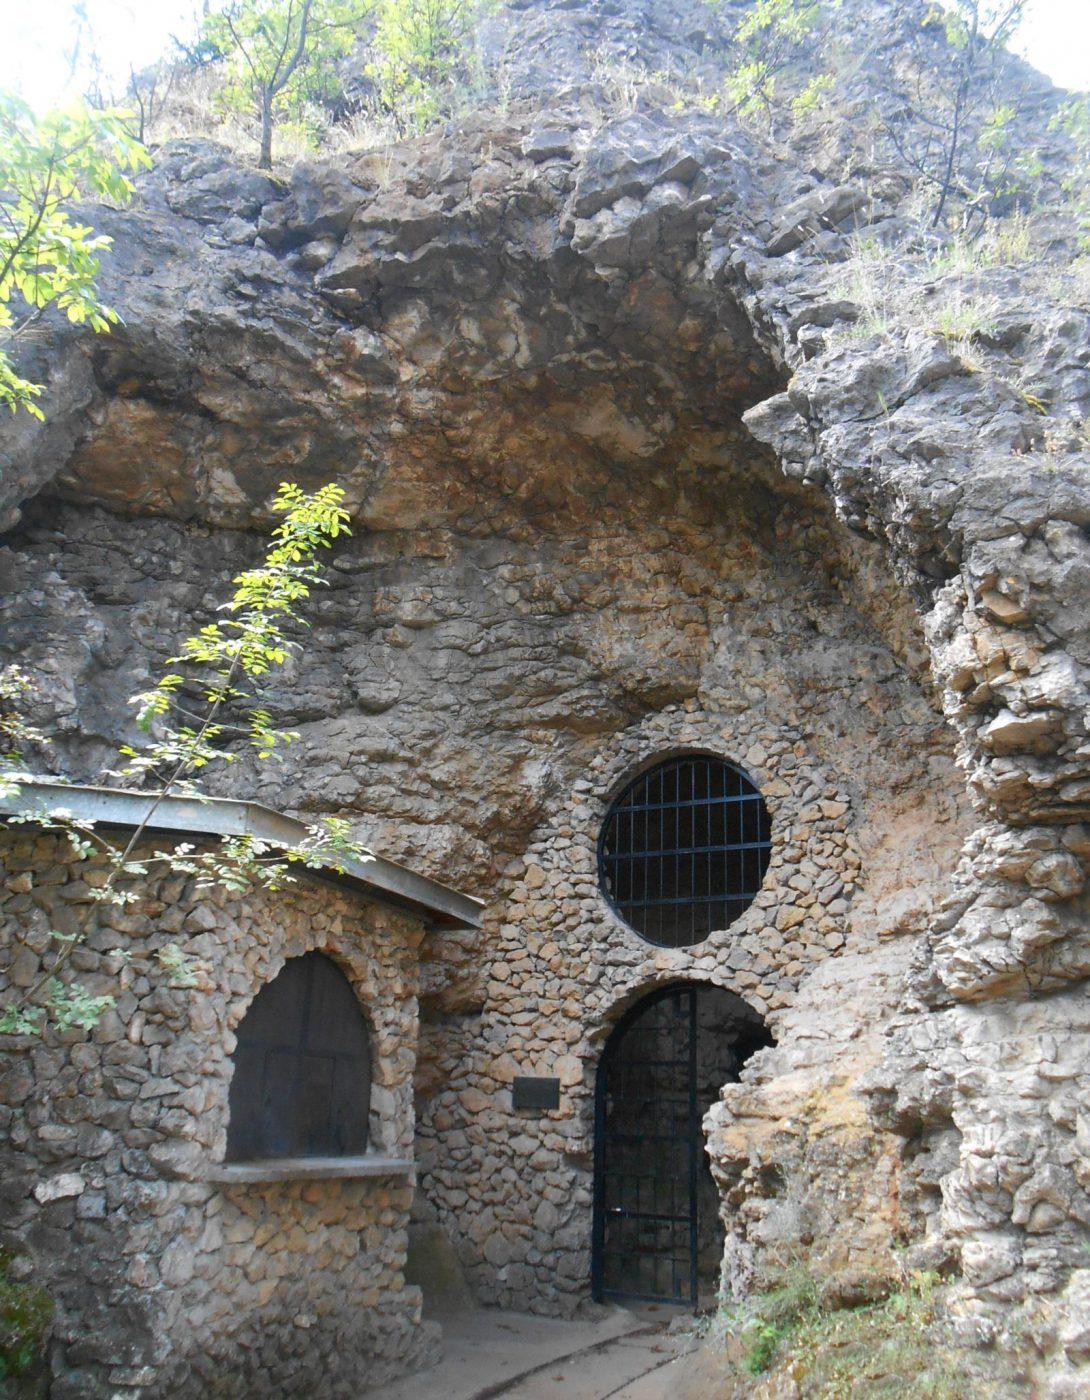 Pećina Risovača, Aranđelovac, Narodni muzej